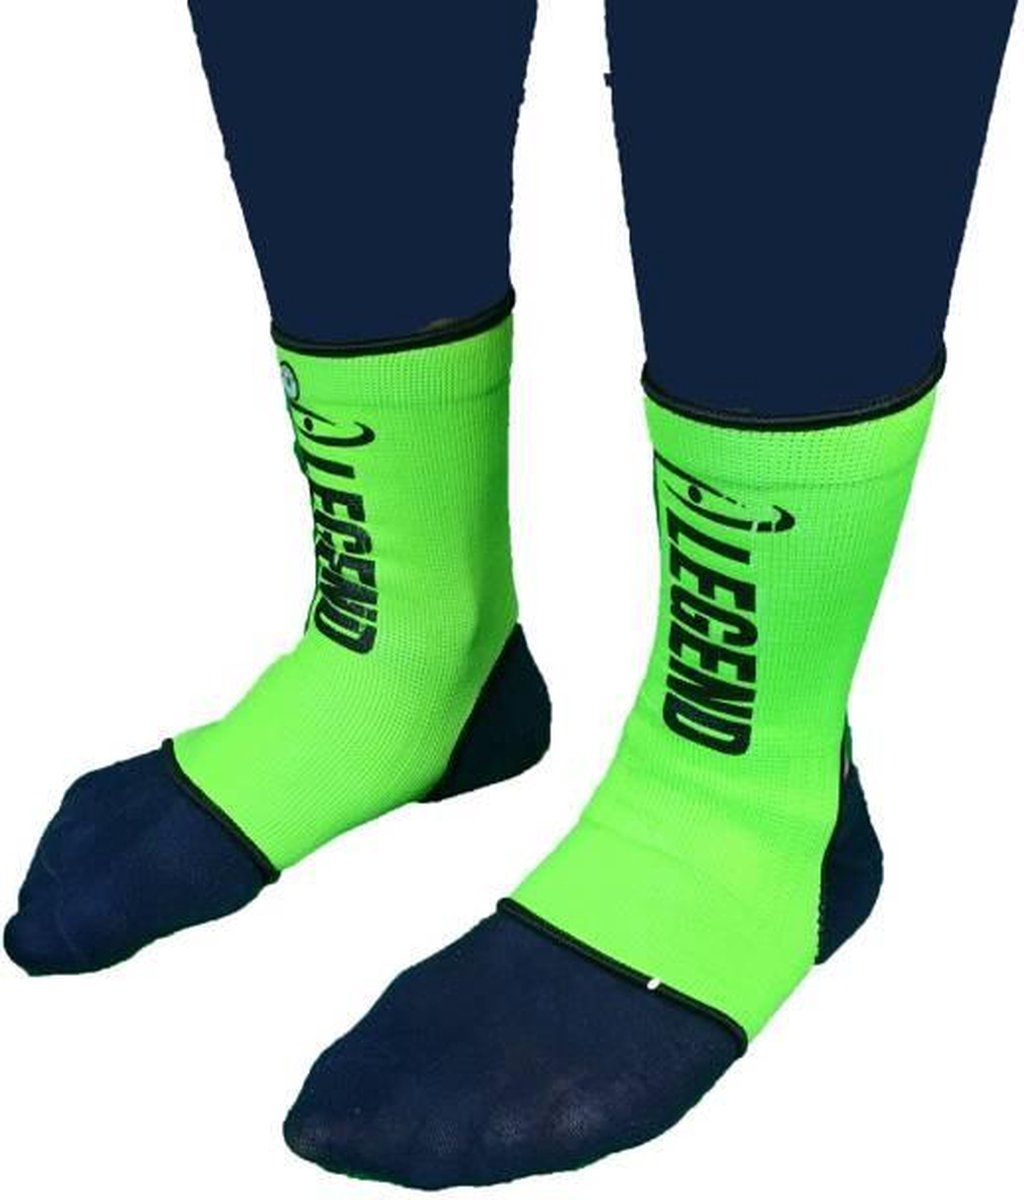 Enkel Bandage Legend Neon Groen